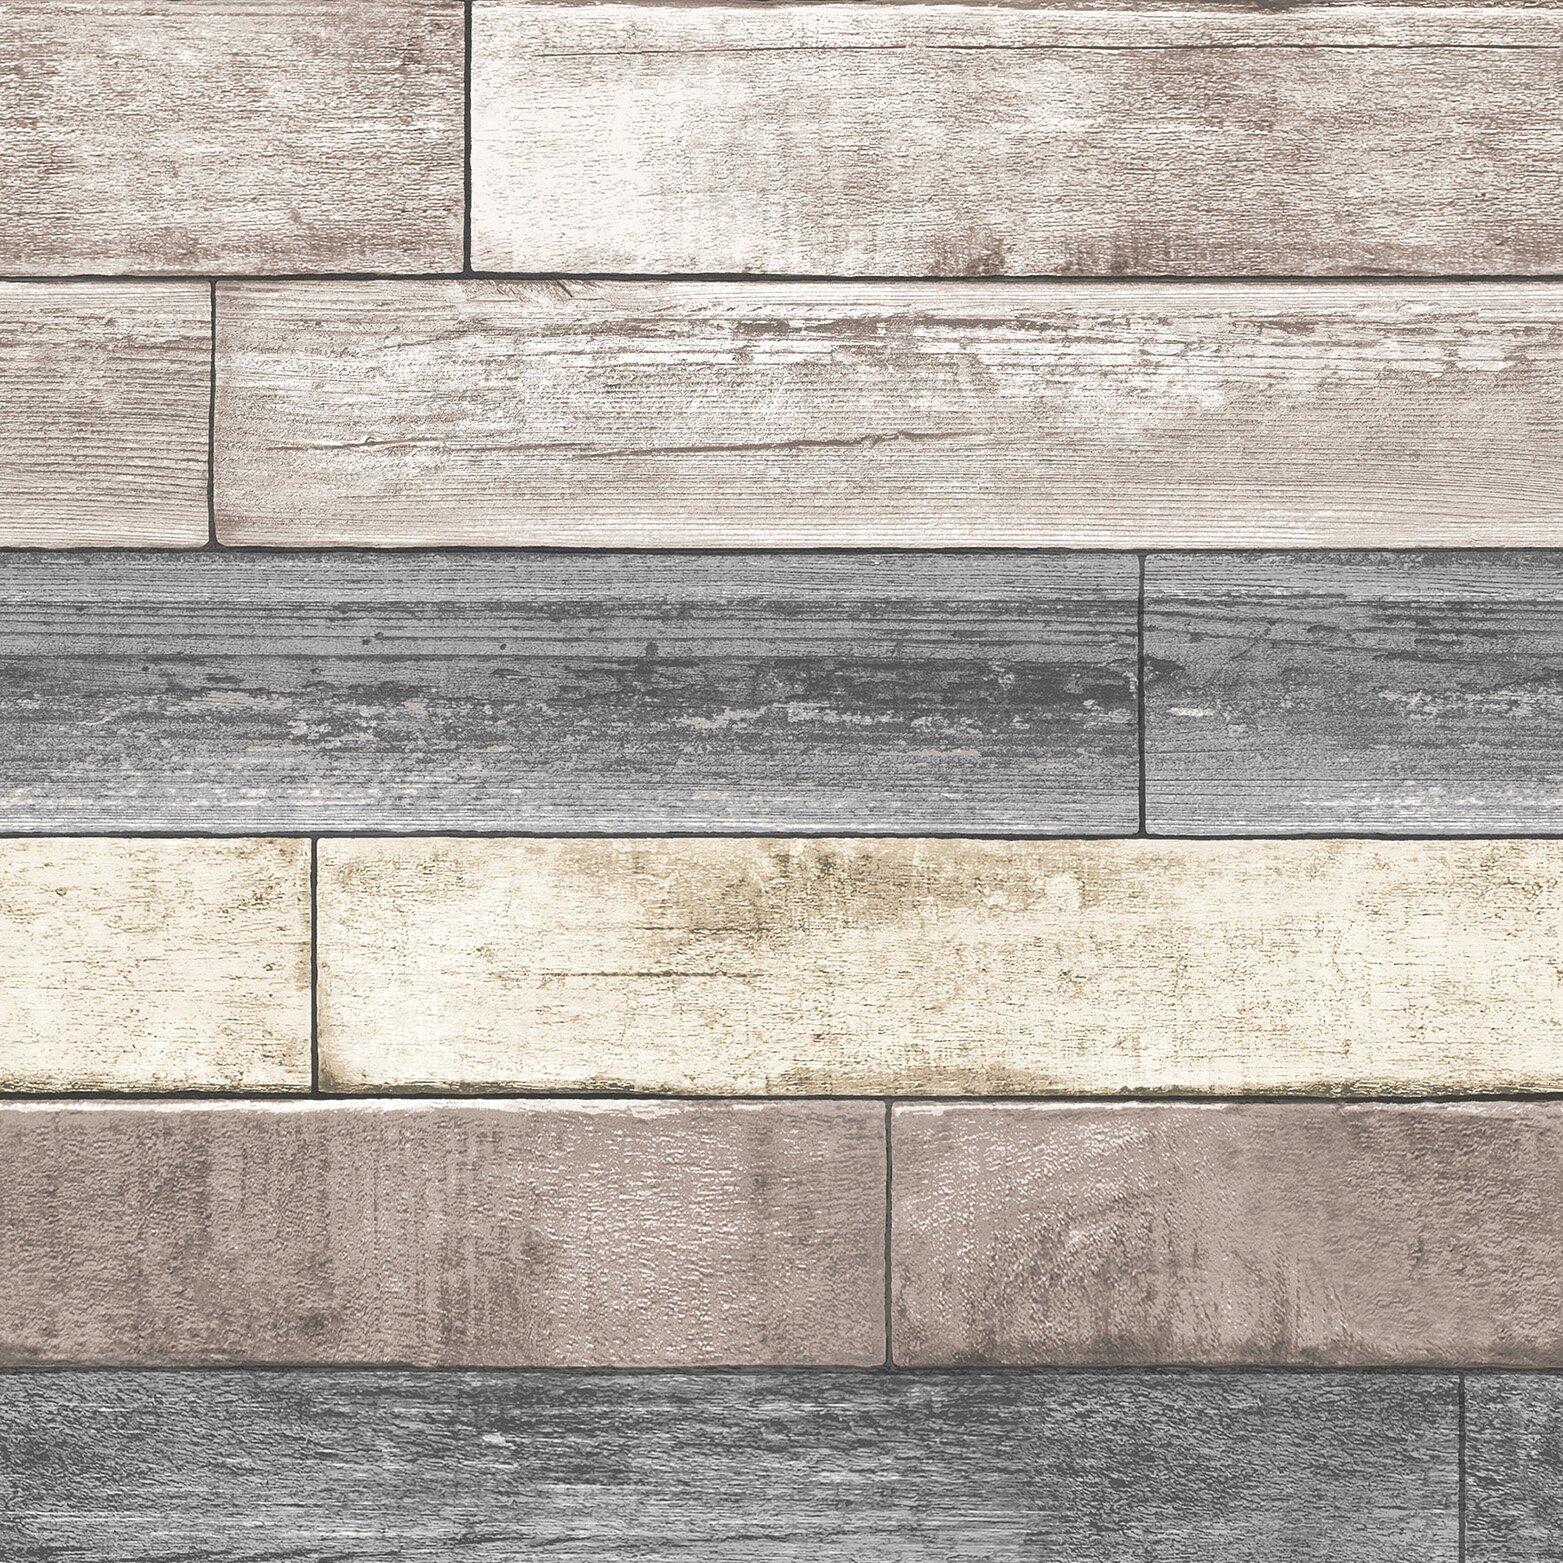 nu 18 39 x 20 5 reclaimed wood plank natural peel and stick wallpaper wayfair. Black Bedroom Furniture Sets. Home Design Ideas